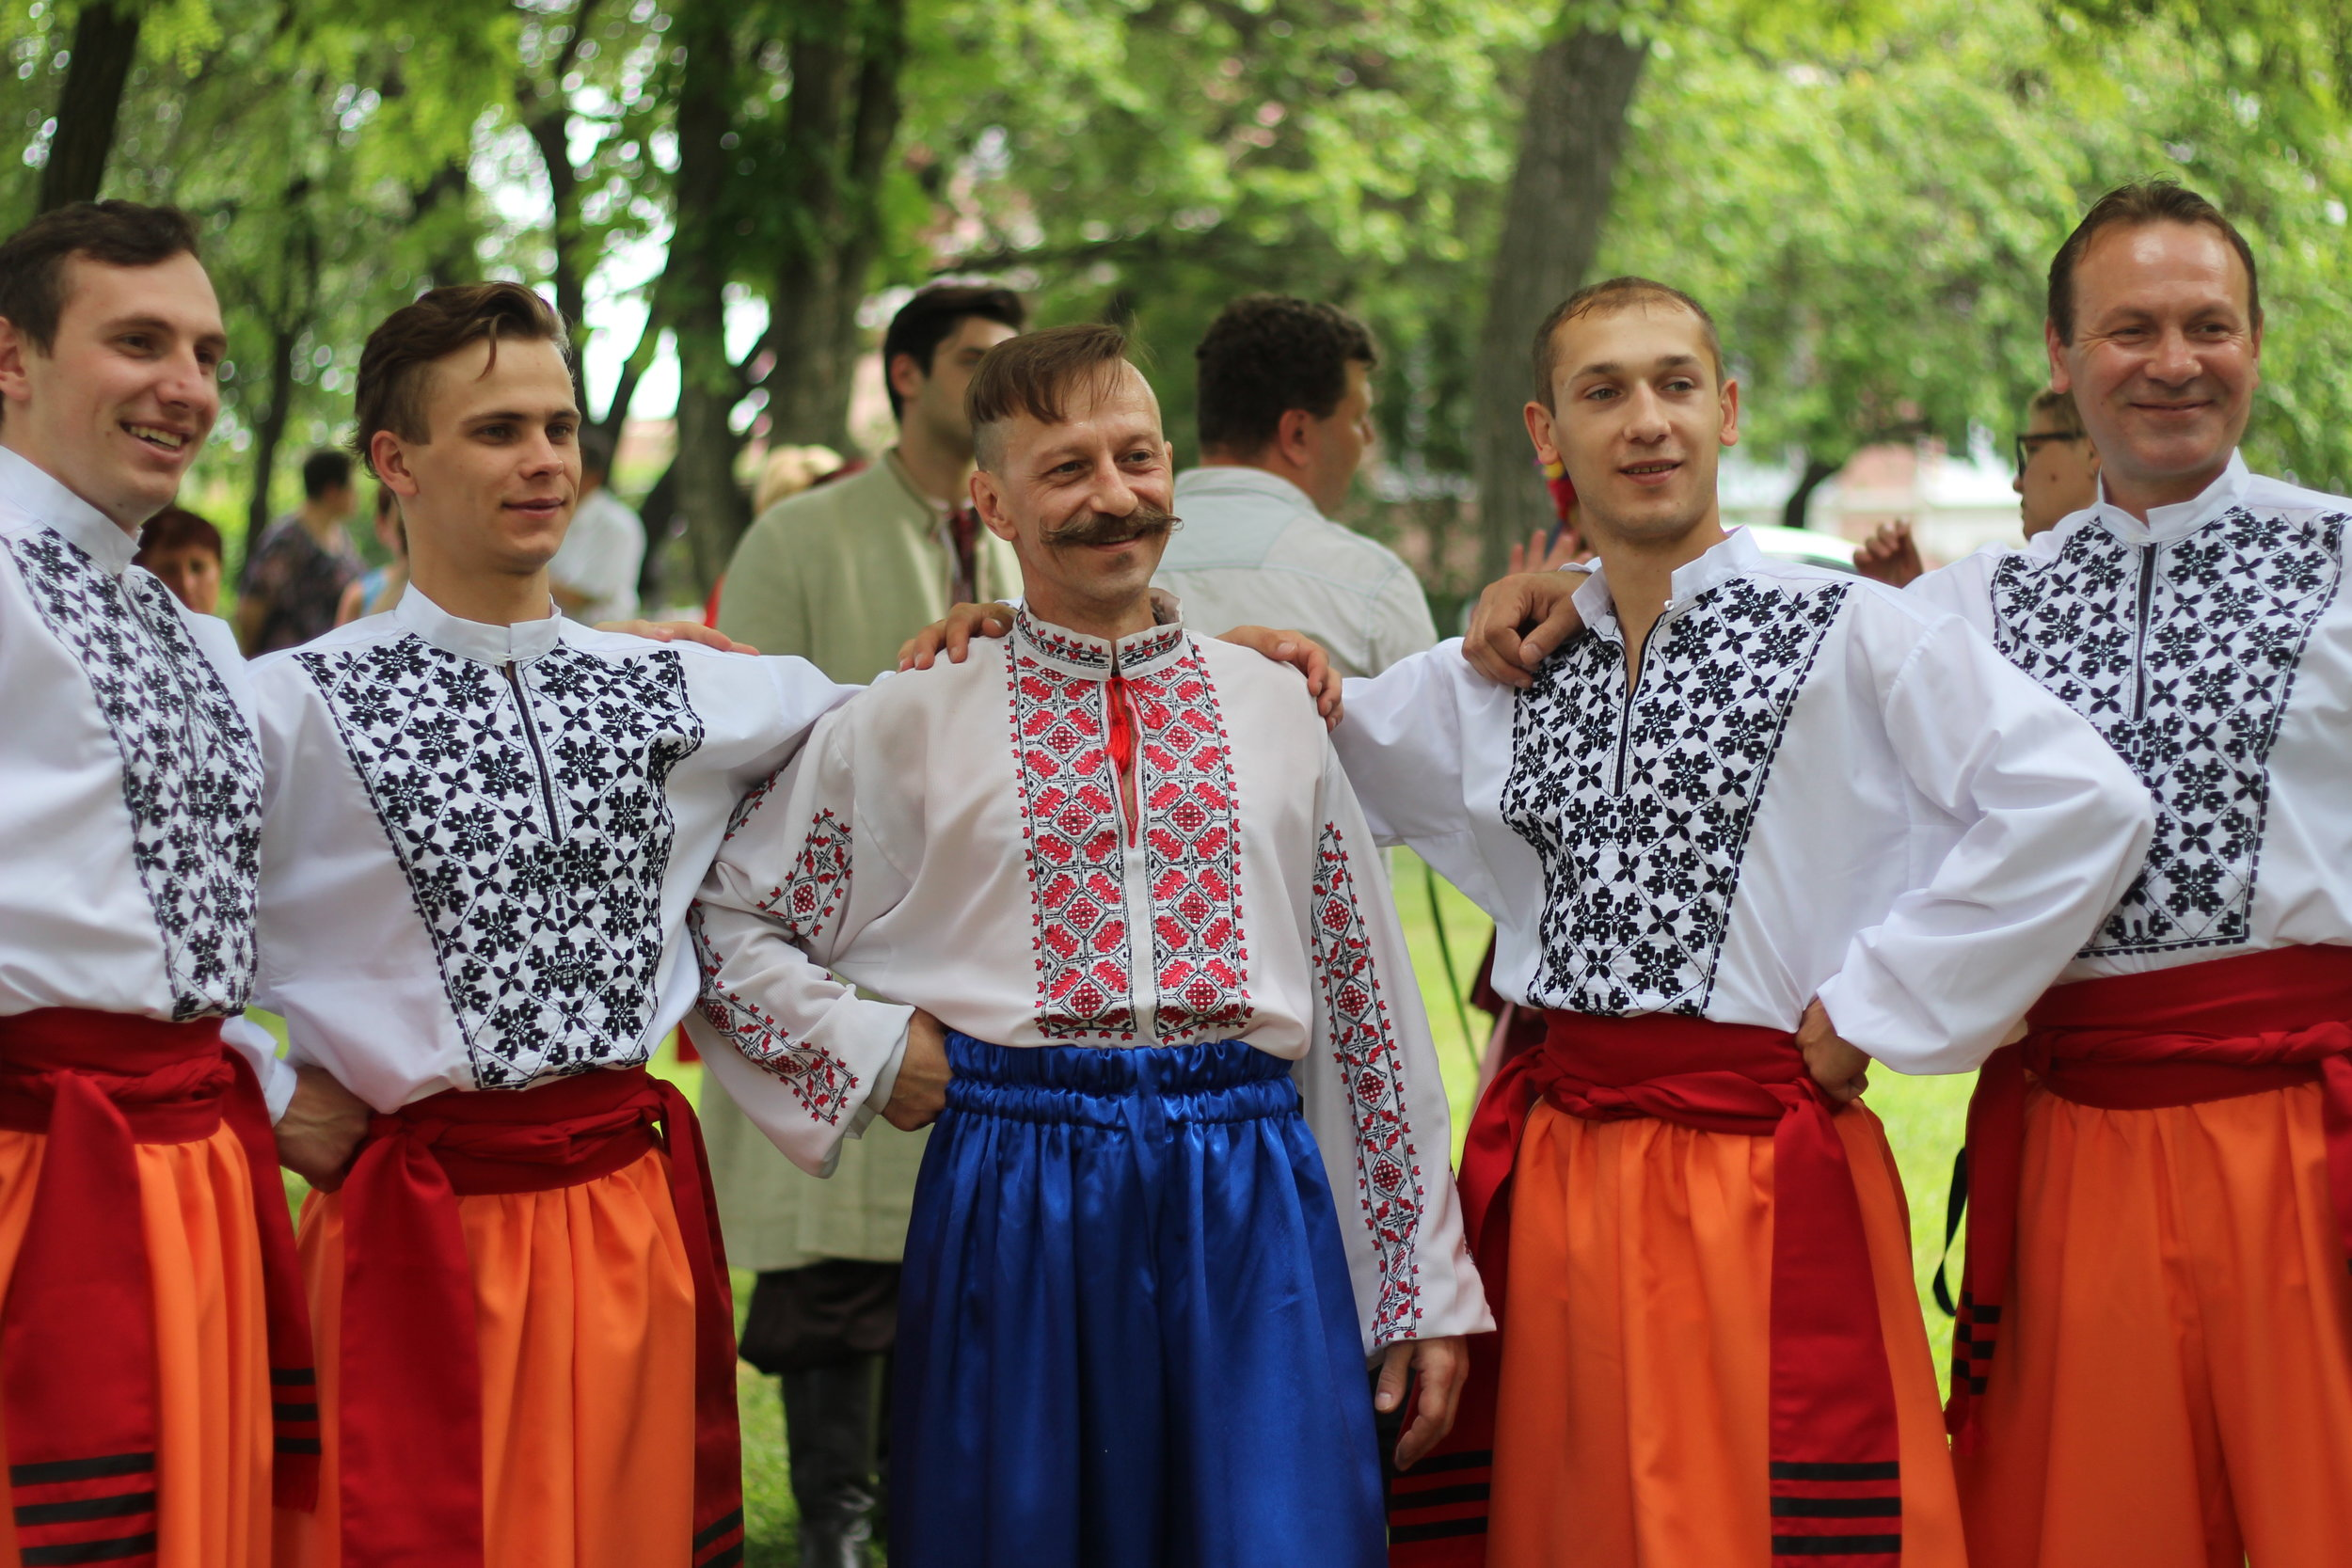 The men of the Poltava Ensemble.